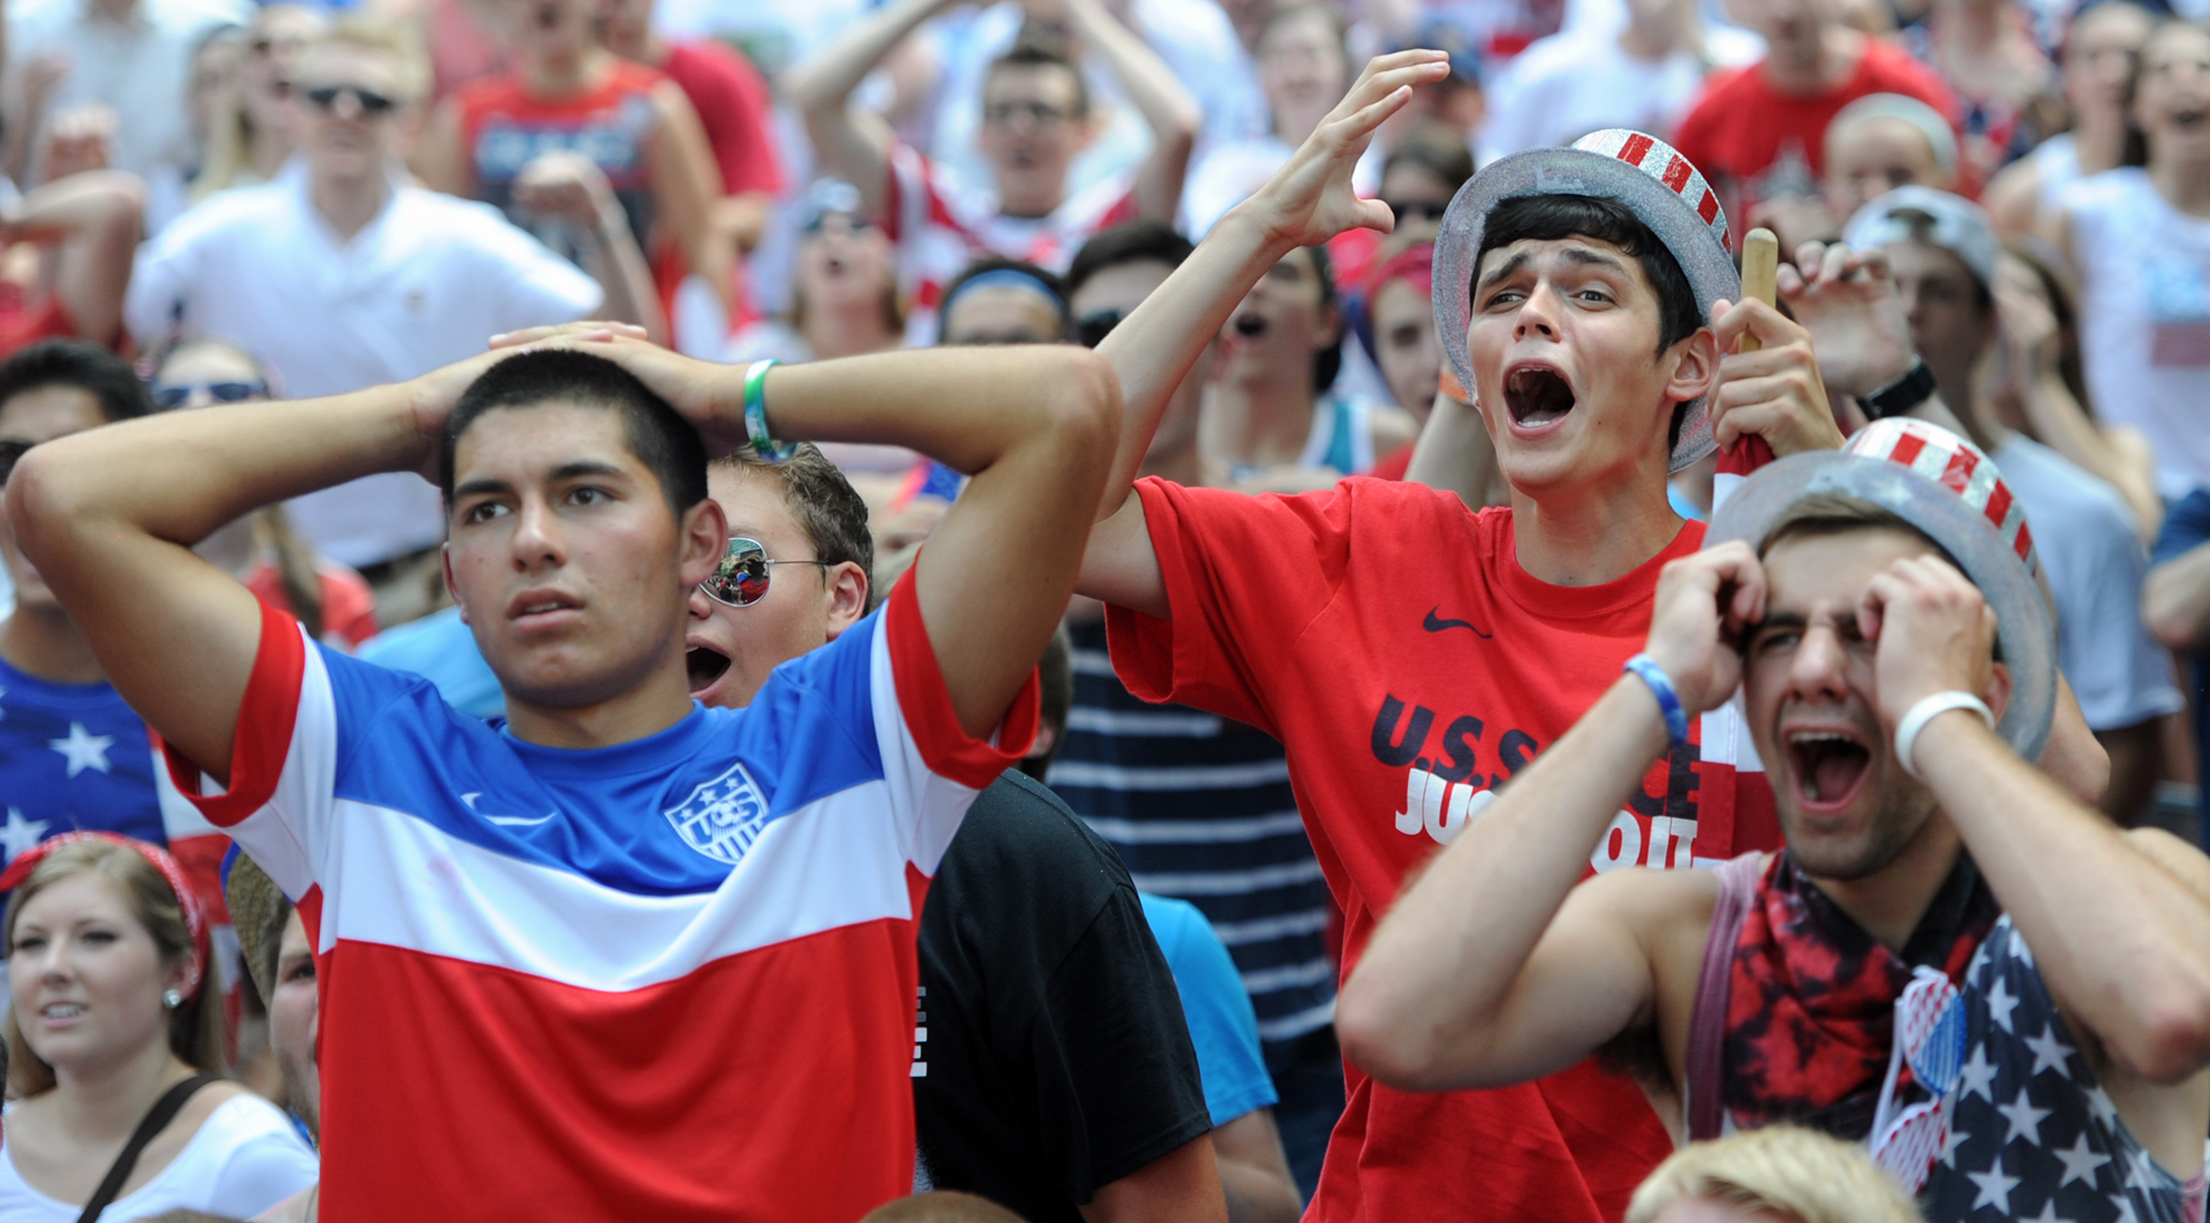 Pittsburgh Soccer Fans Resolute Despite U S Defeat